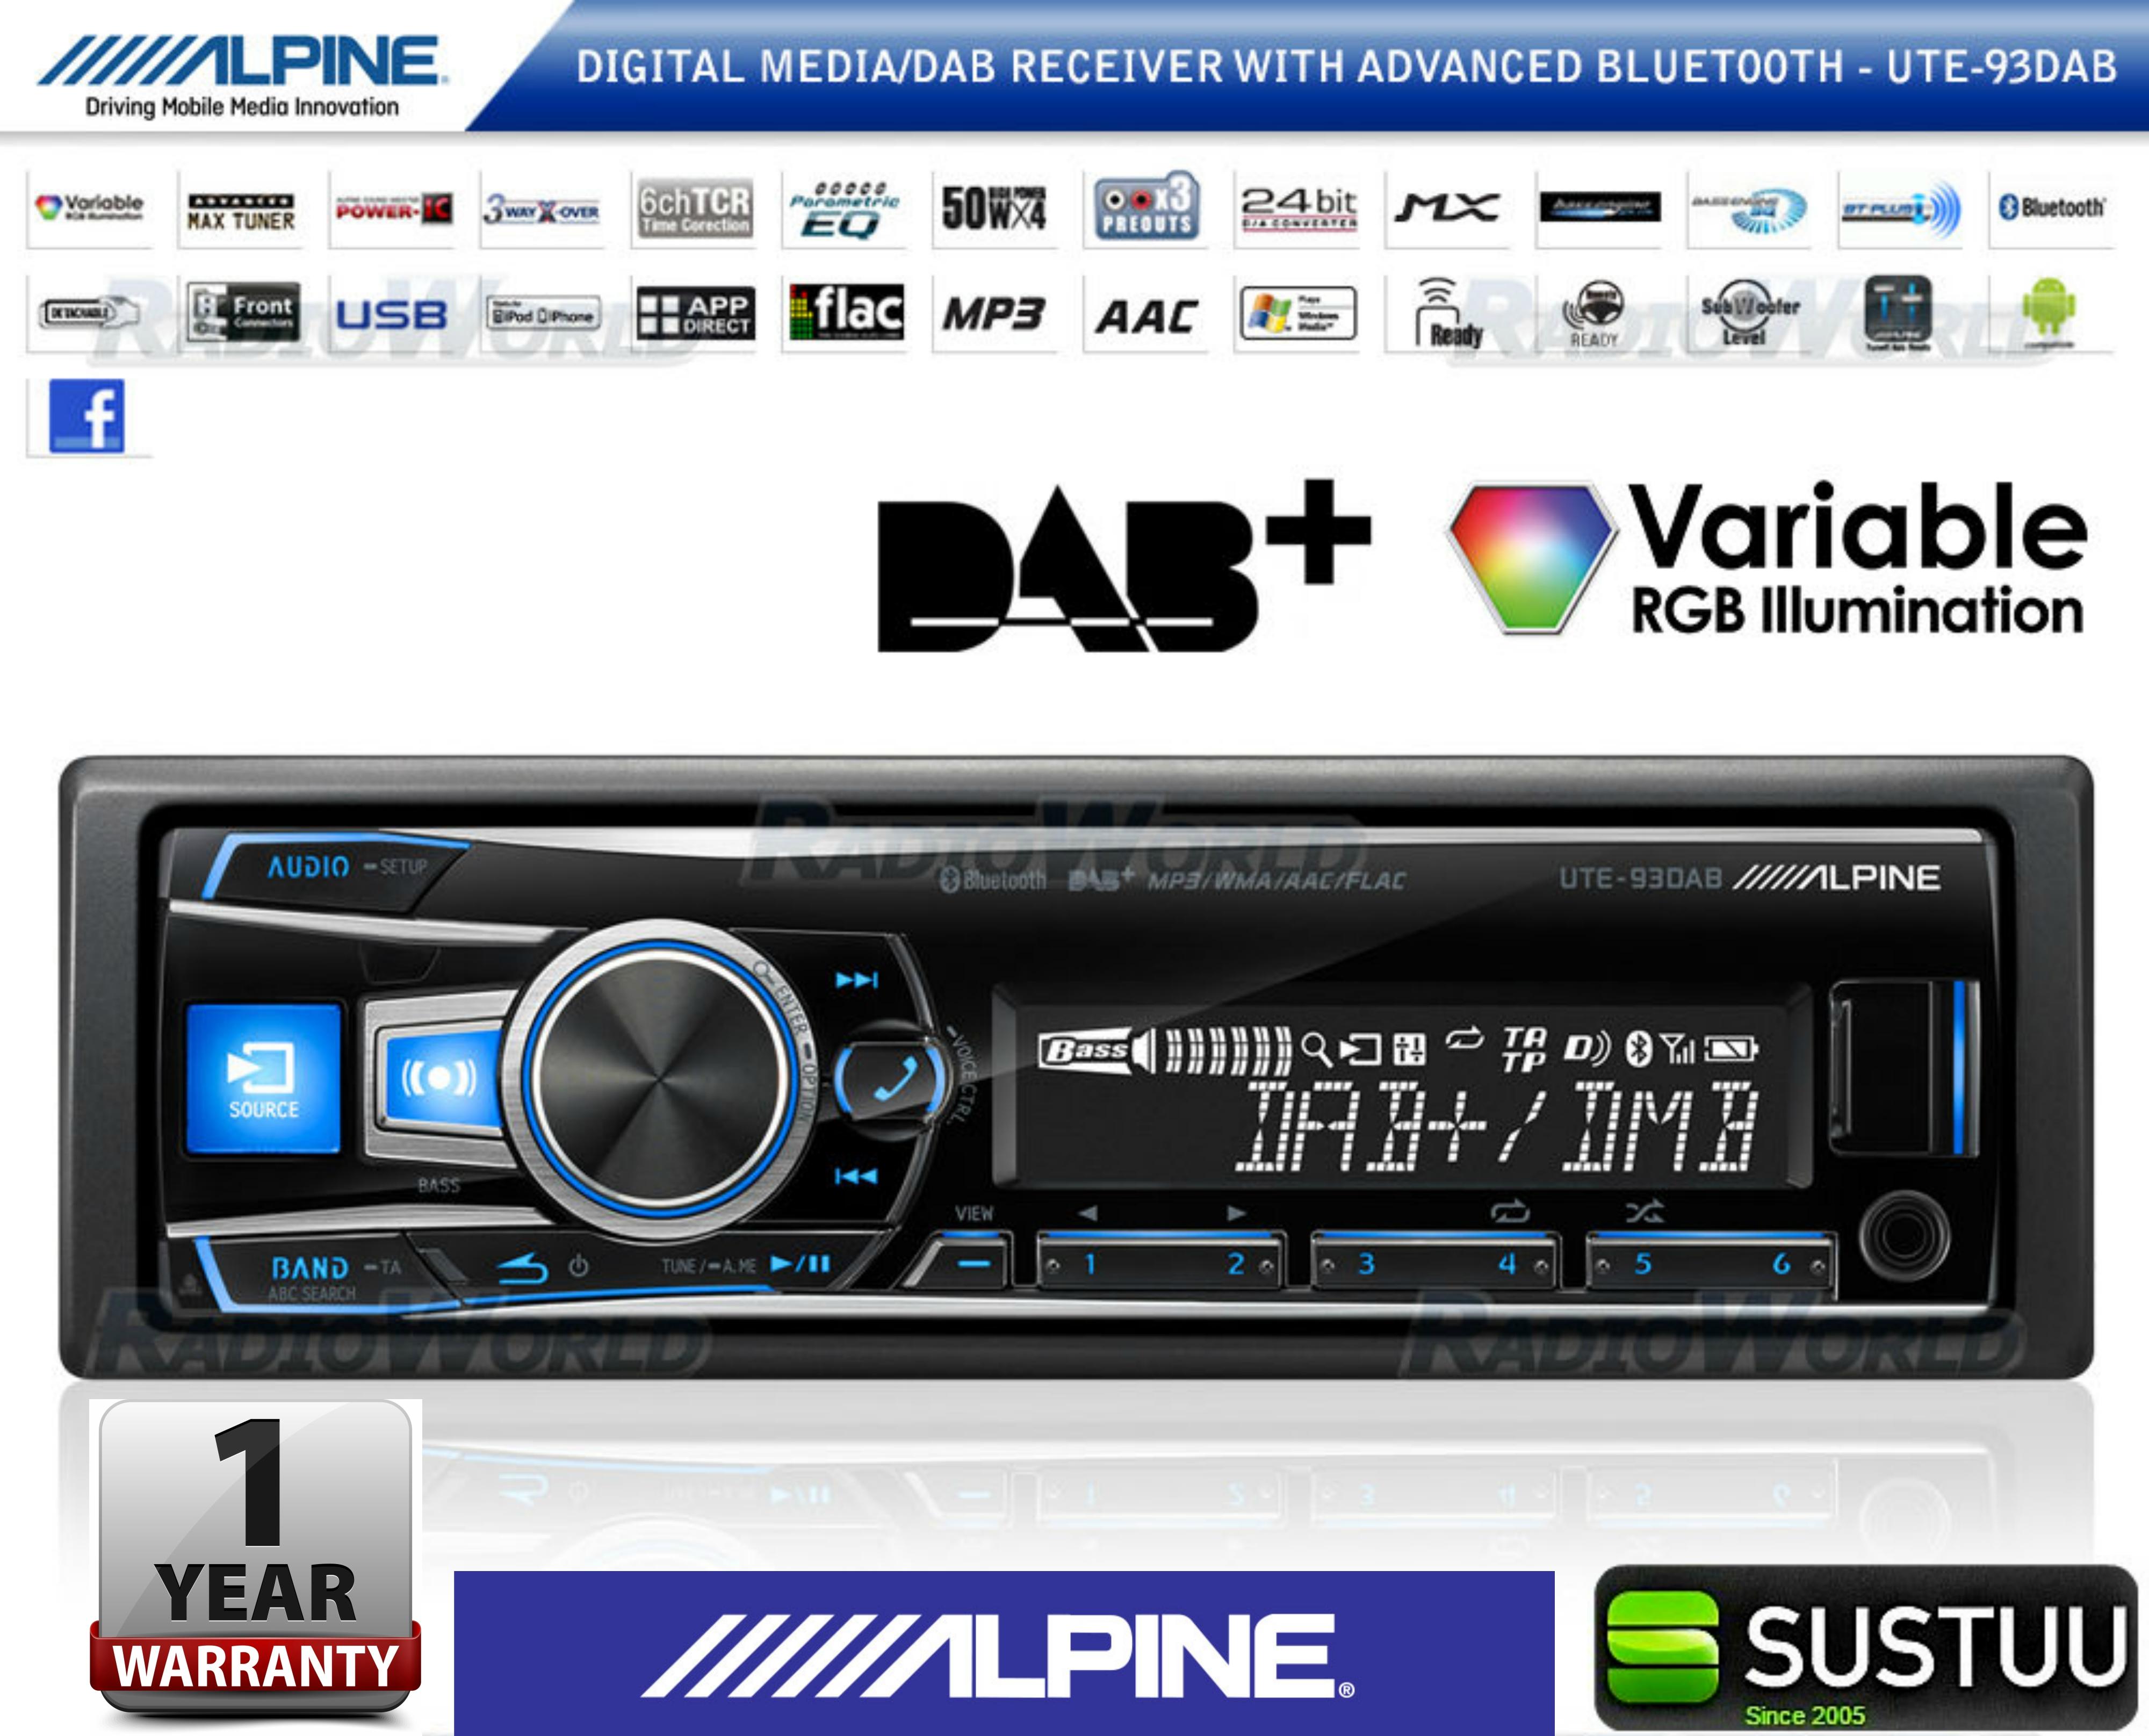 Alpine UTE 93DAB Digital Car Media Receiver Mechless Usb DAB+Bluetooth Front Aux